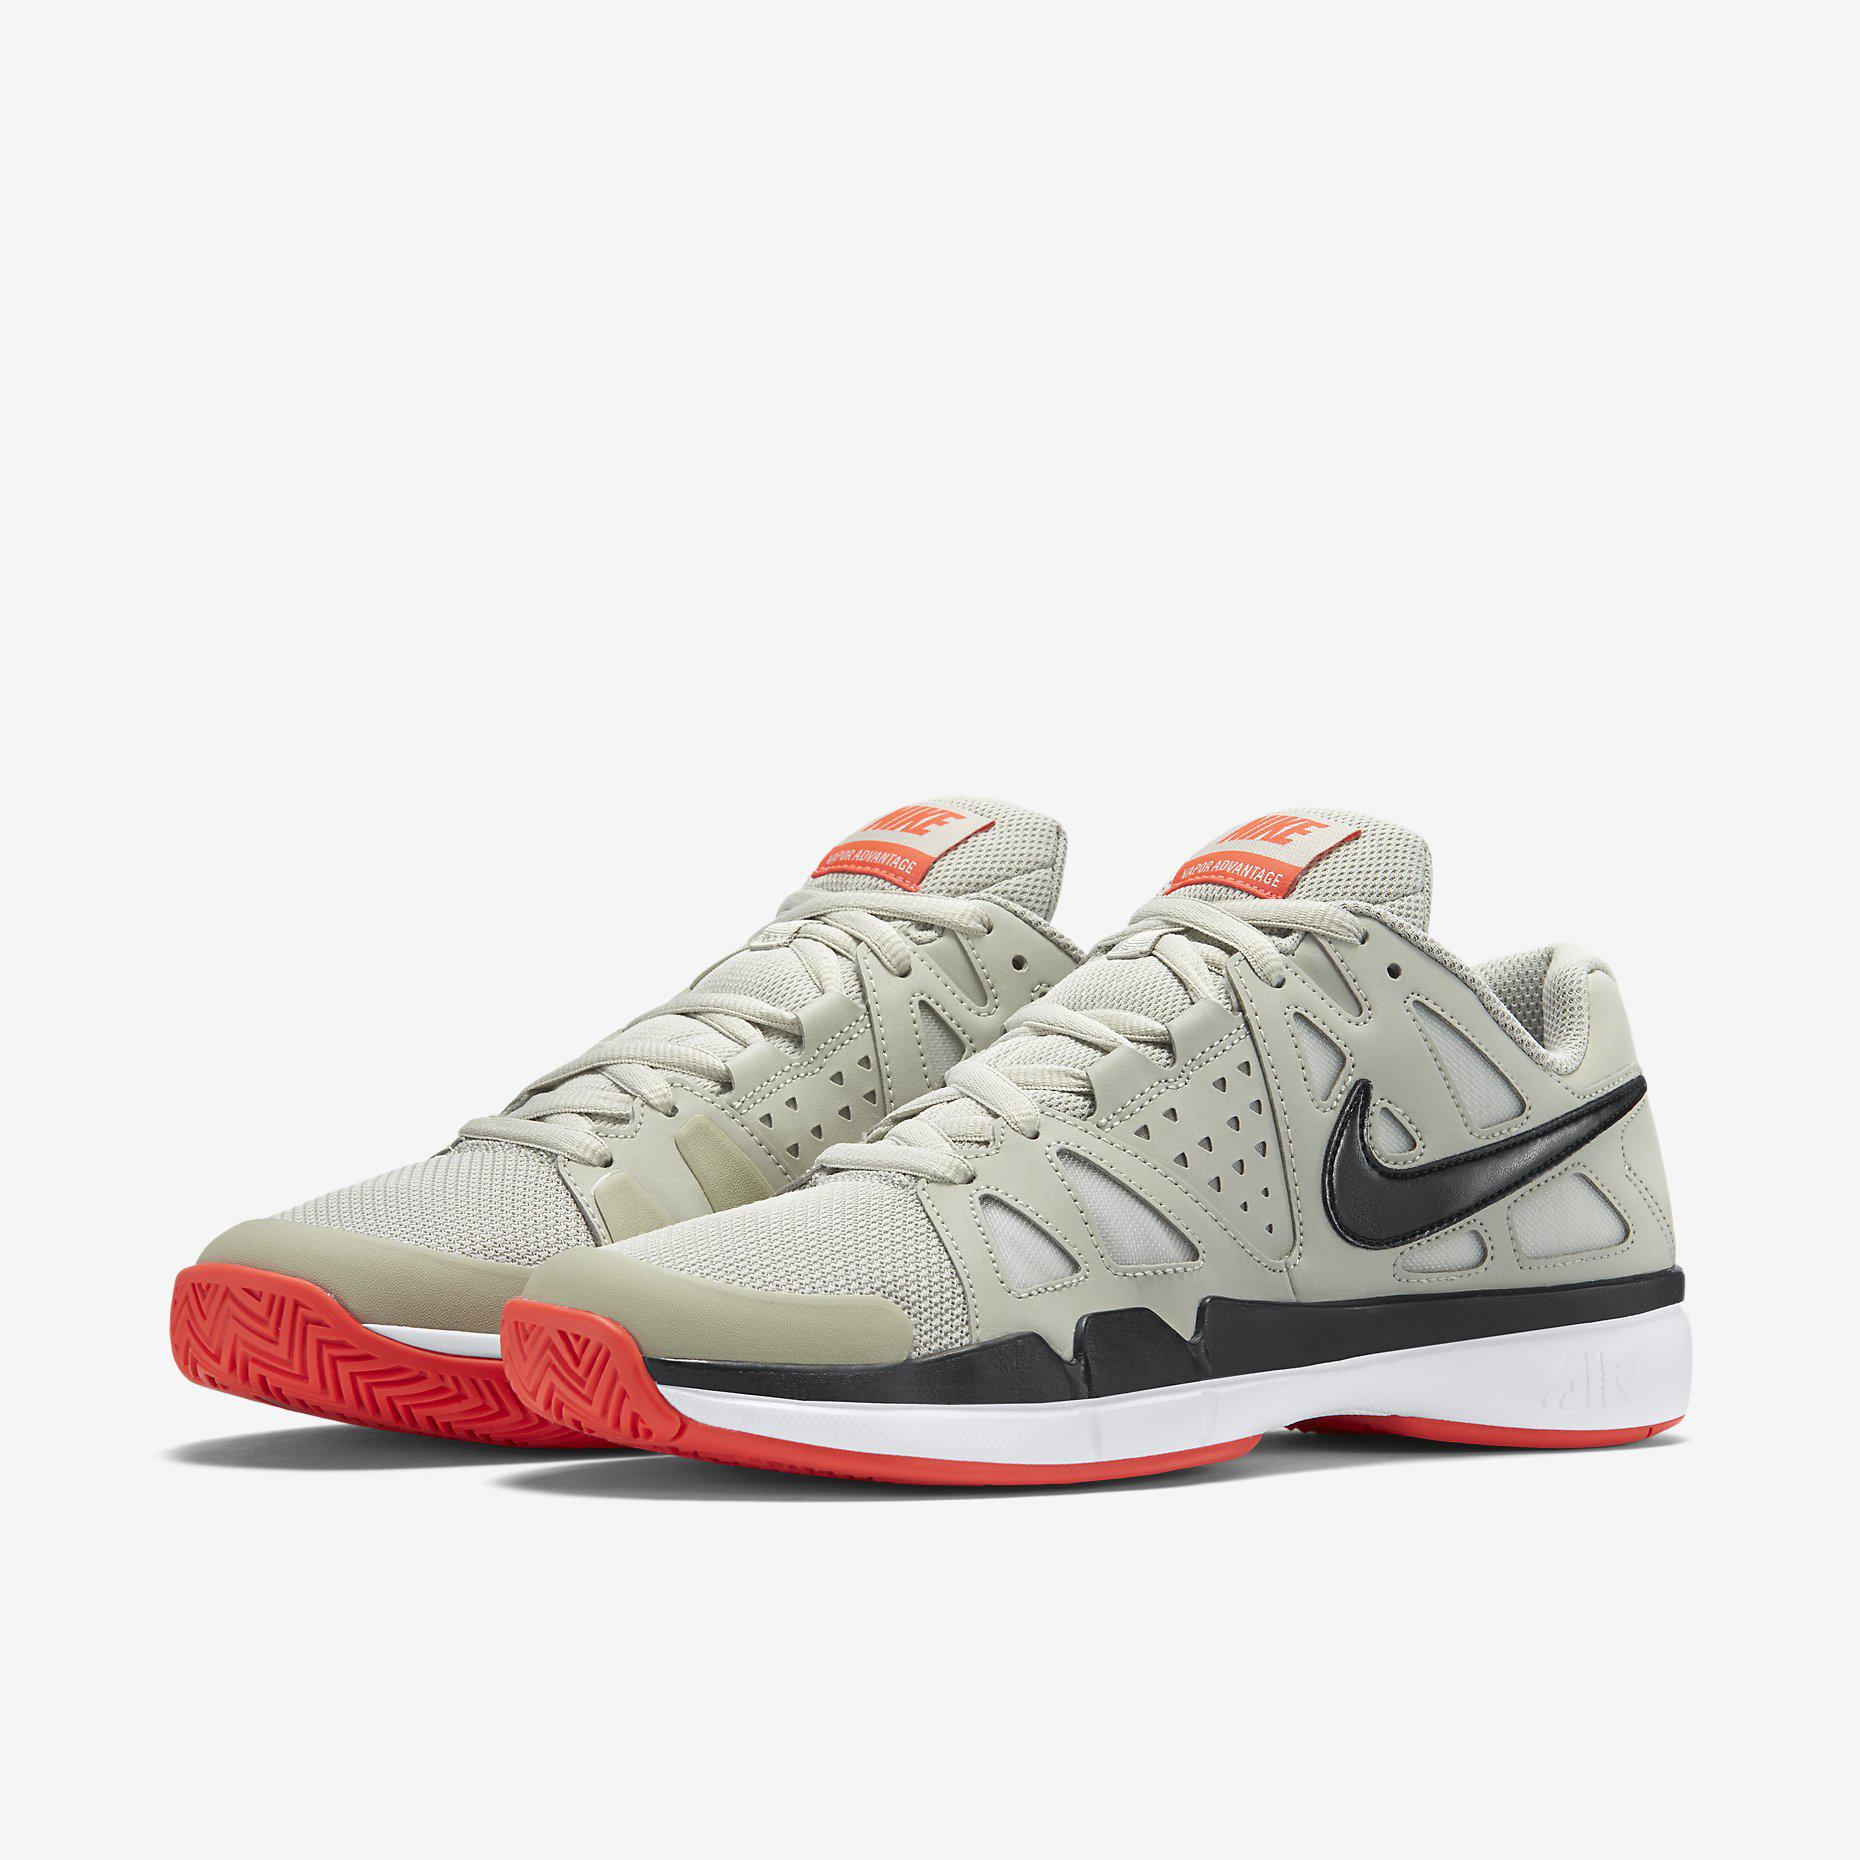 super popular fcd8d 027f9 ... spain nike mens air vapor advantage tennis shoes lunar grey bright  crimson 99563 a9cda